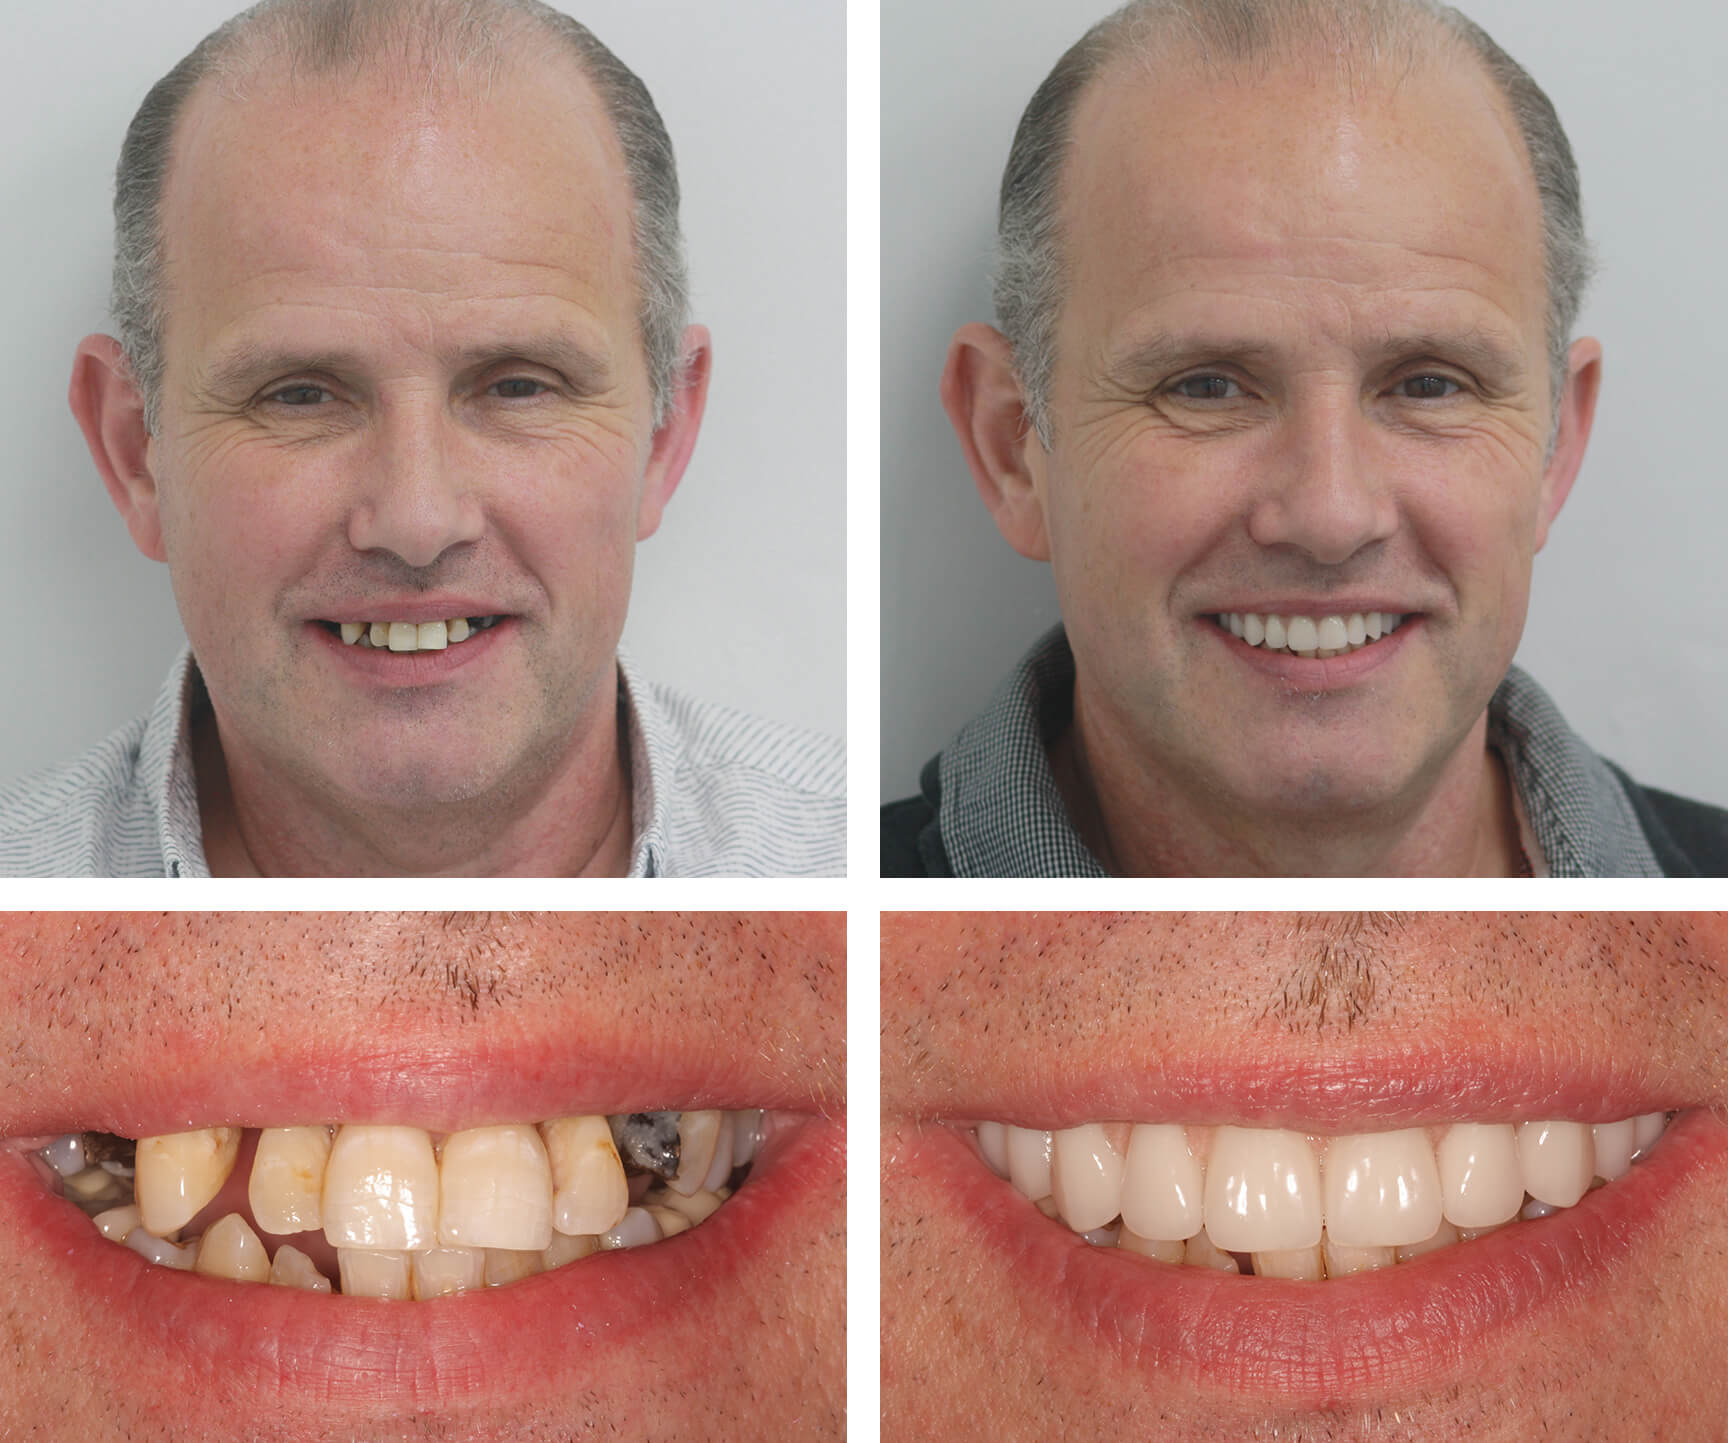 Ebony ivory teeth whitening